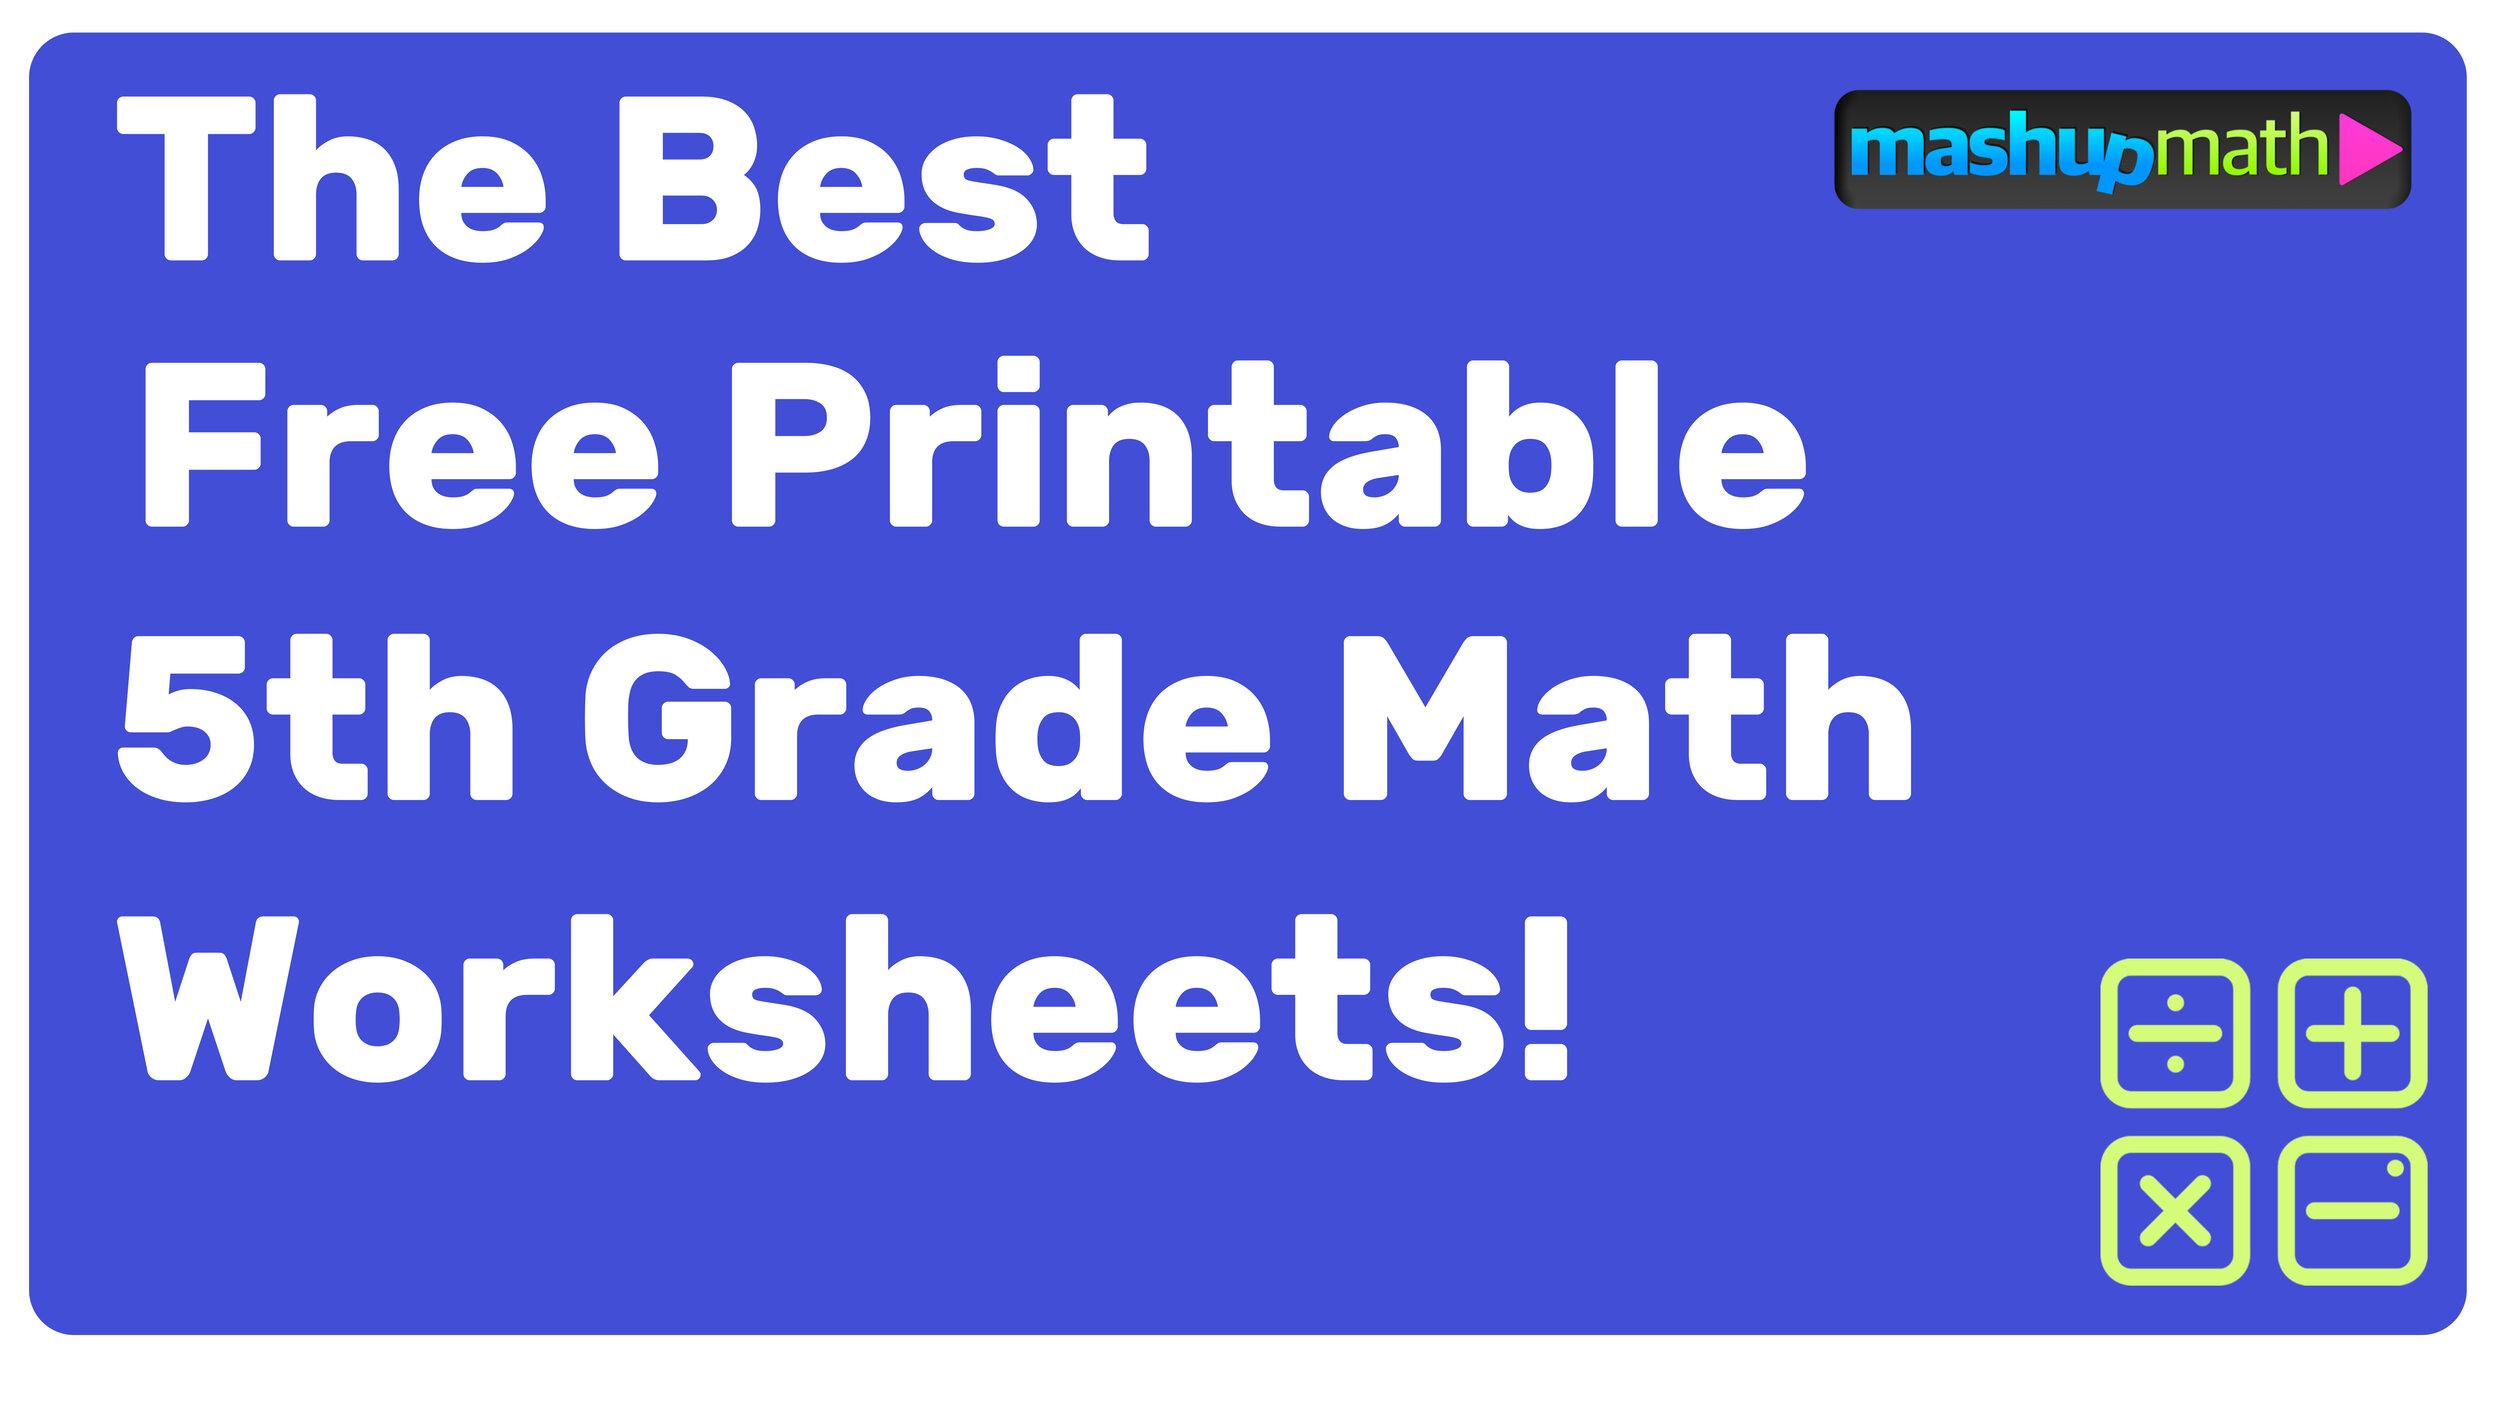 medium resolution of Free Printable 5th Grade Math Worksheets (with Answers!) — Mashup Math